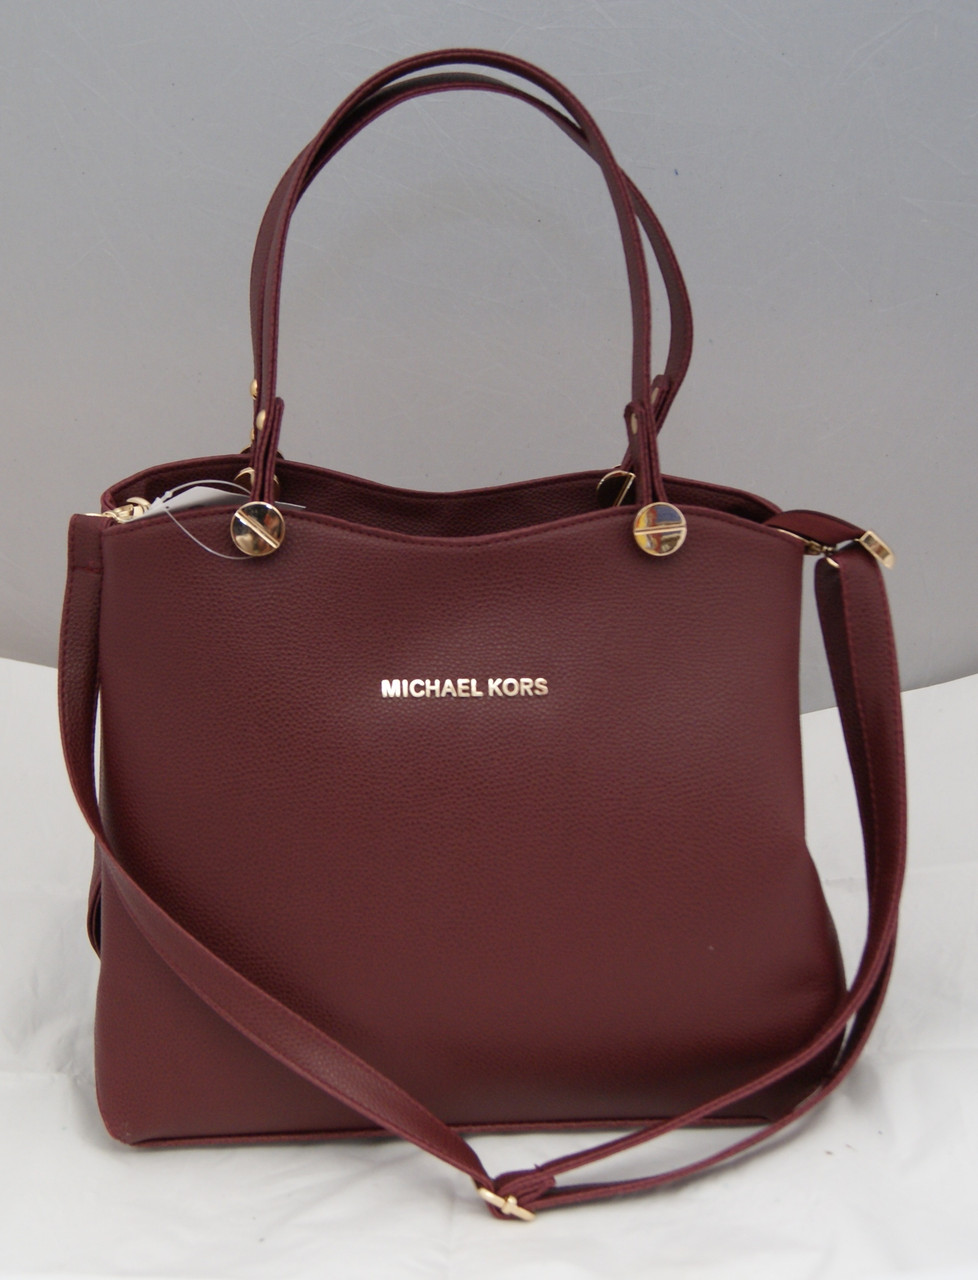 b90b9fc0f661 Женская сумка Michael Kors, цвет бордовый Майкл Корс MK: продажа ...